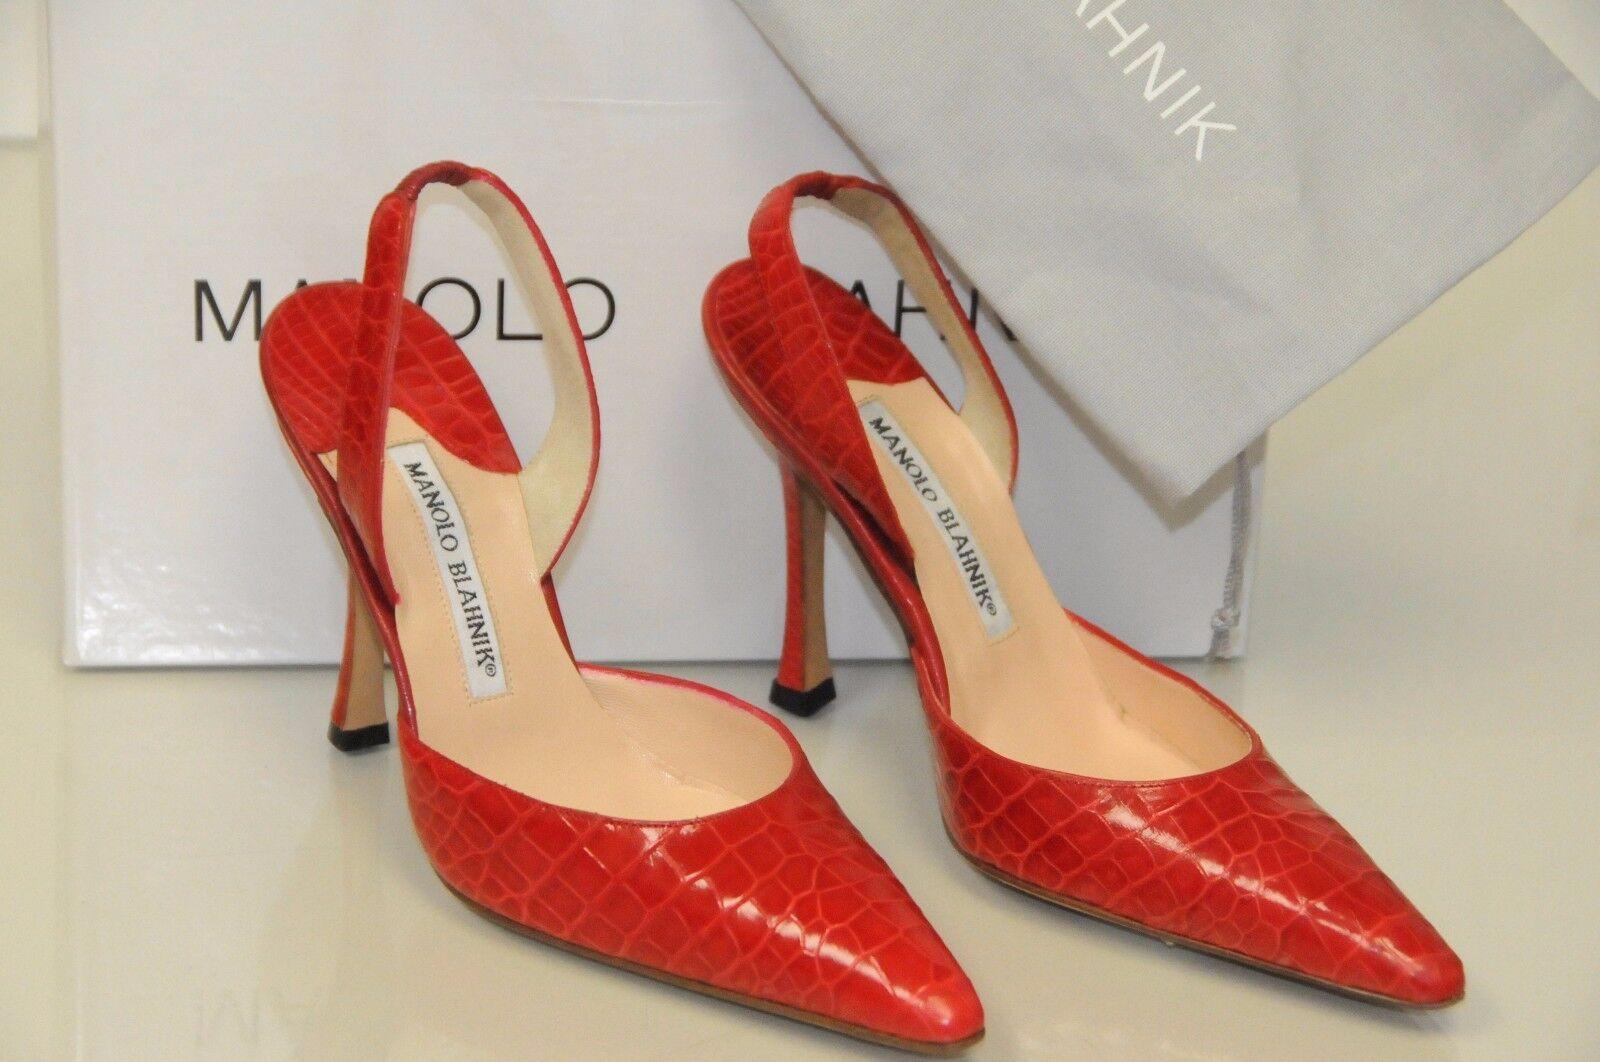 $5400 NEW MANOLO BLAHNIK CAROLYNE RED ALLIGATOR CROCODILE SLINGS SHOES 35.5  36